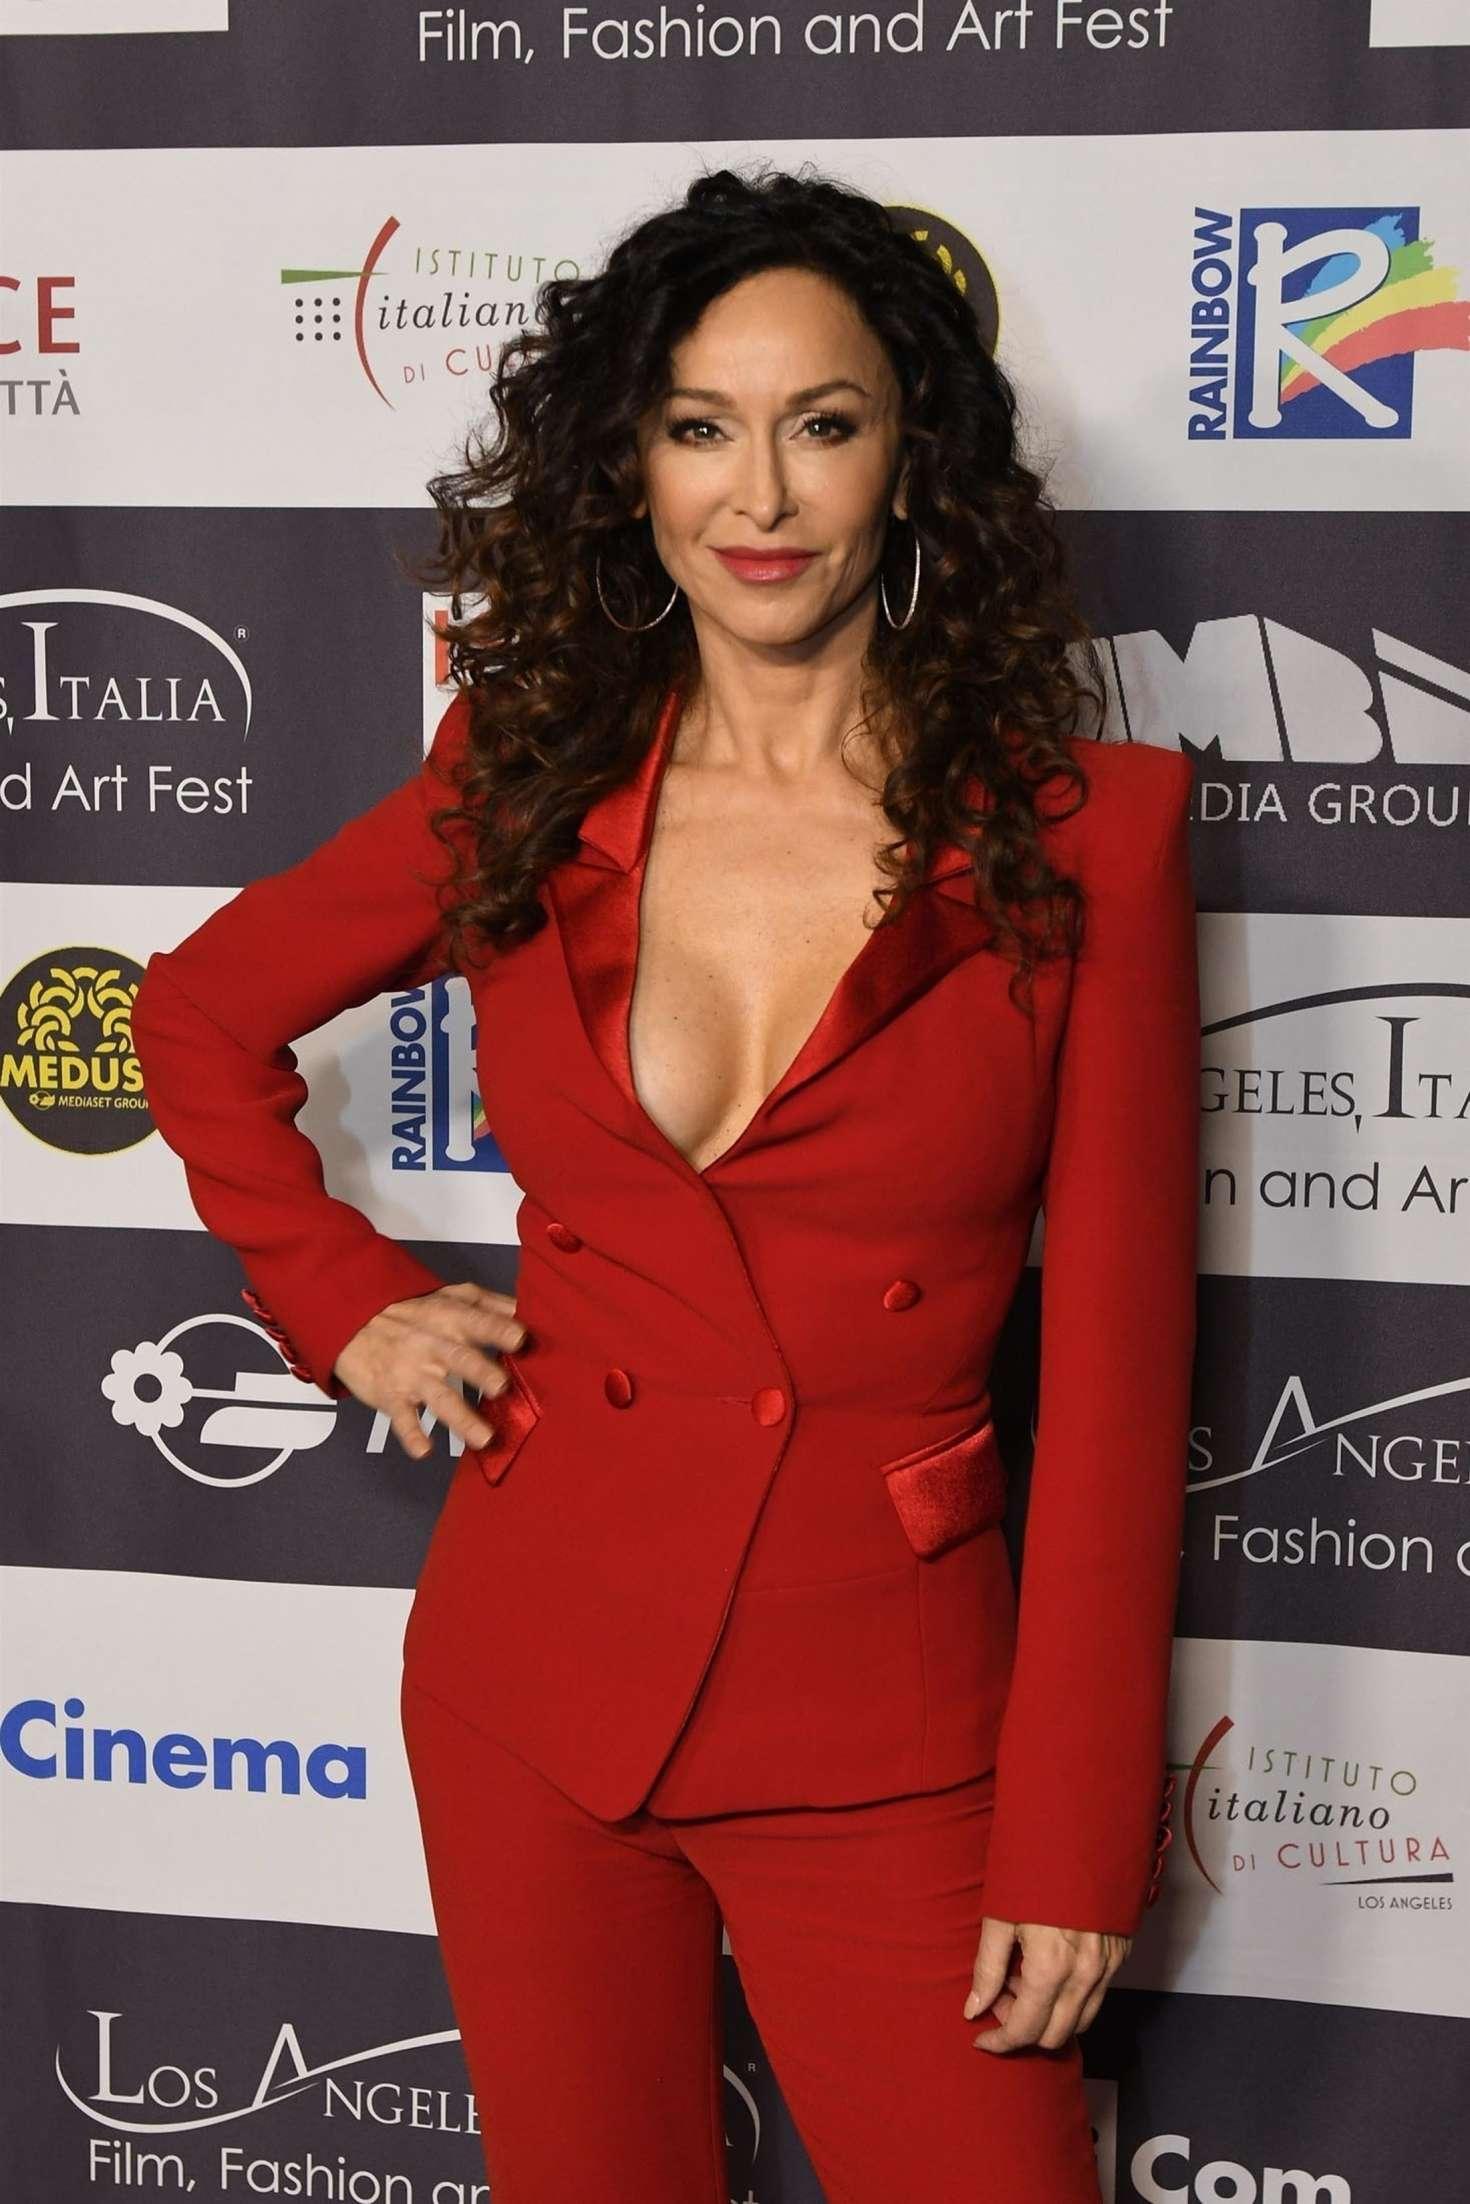 Sofia Milos - Los Angeles Italia Film Fashion and Art Festival 2018 in LA